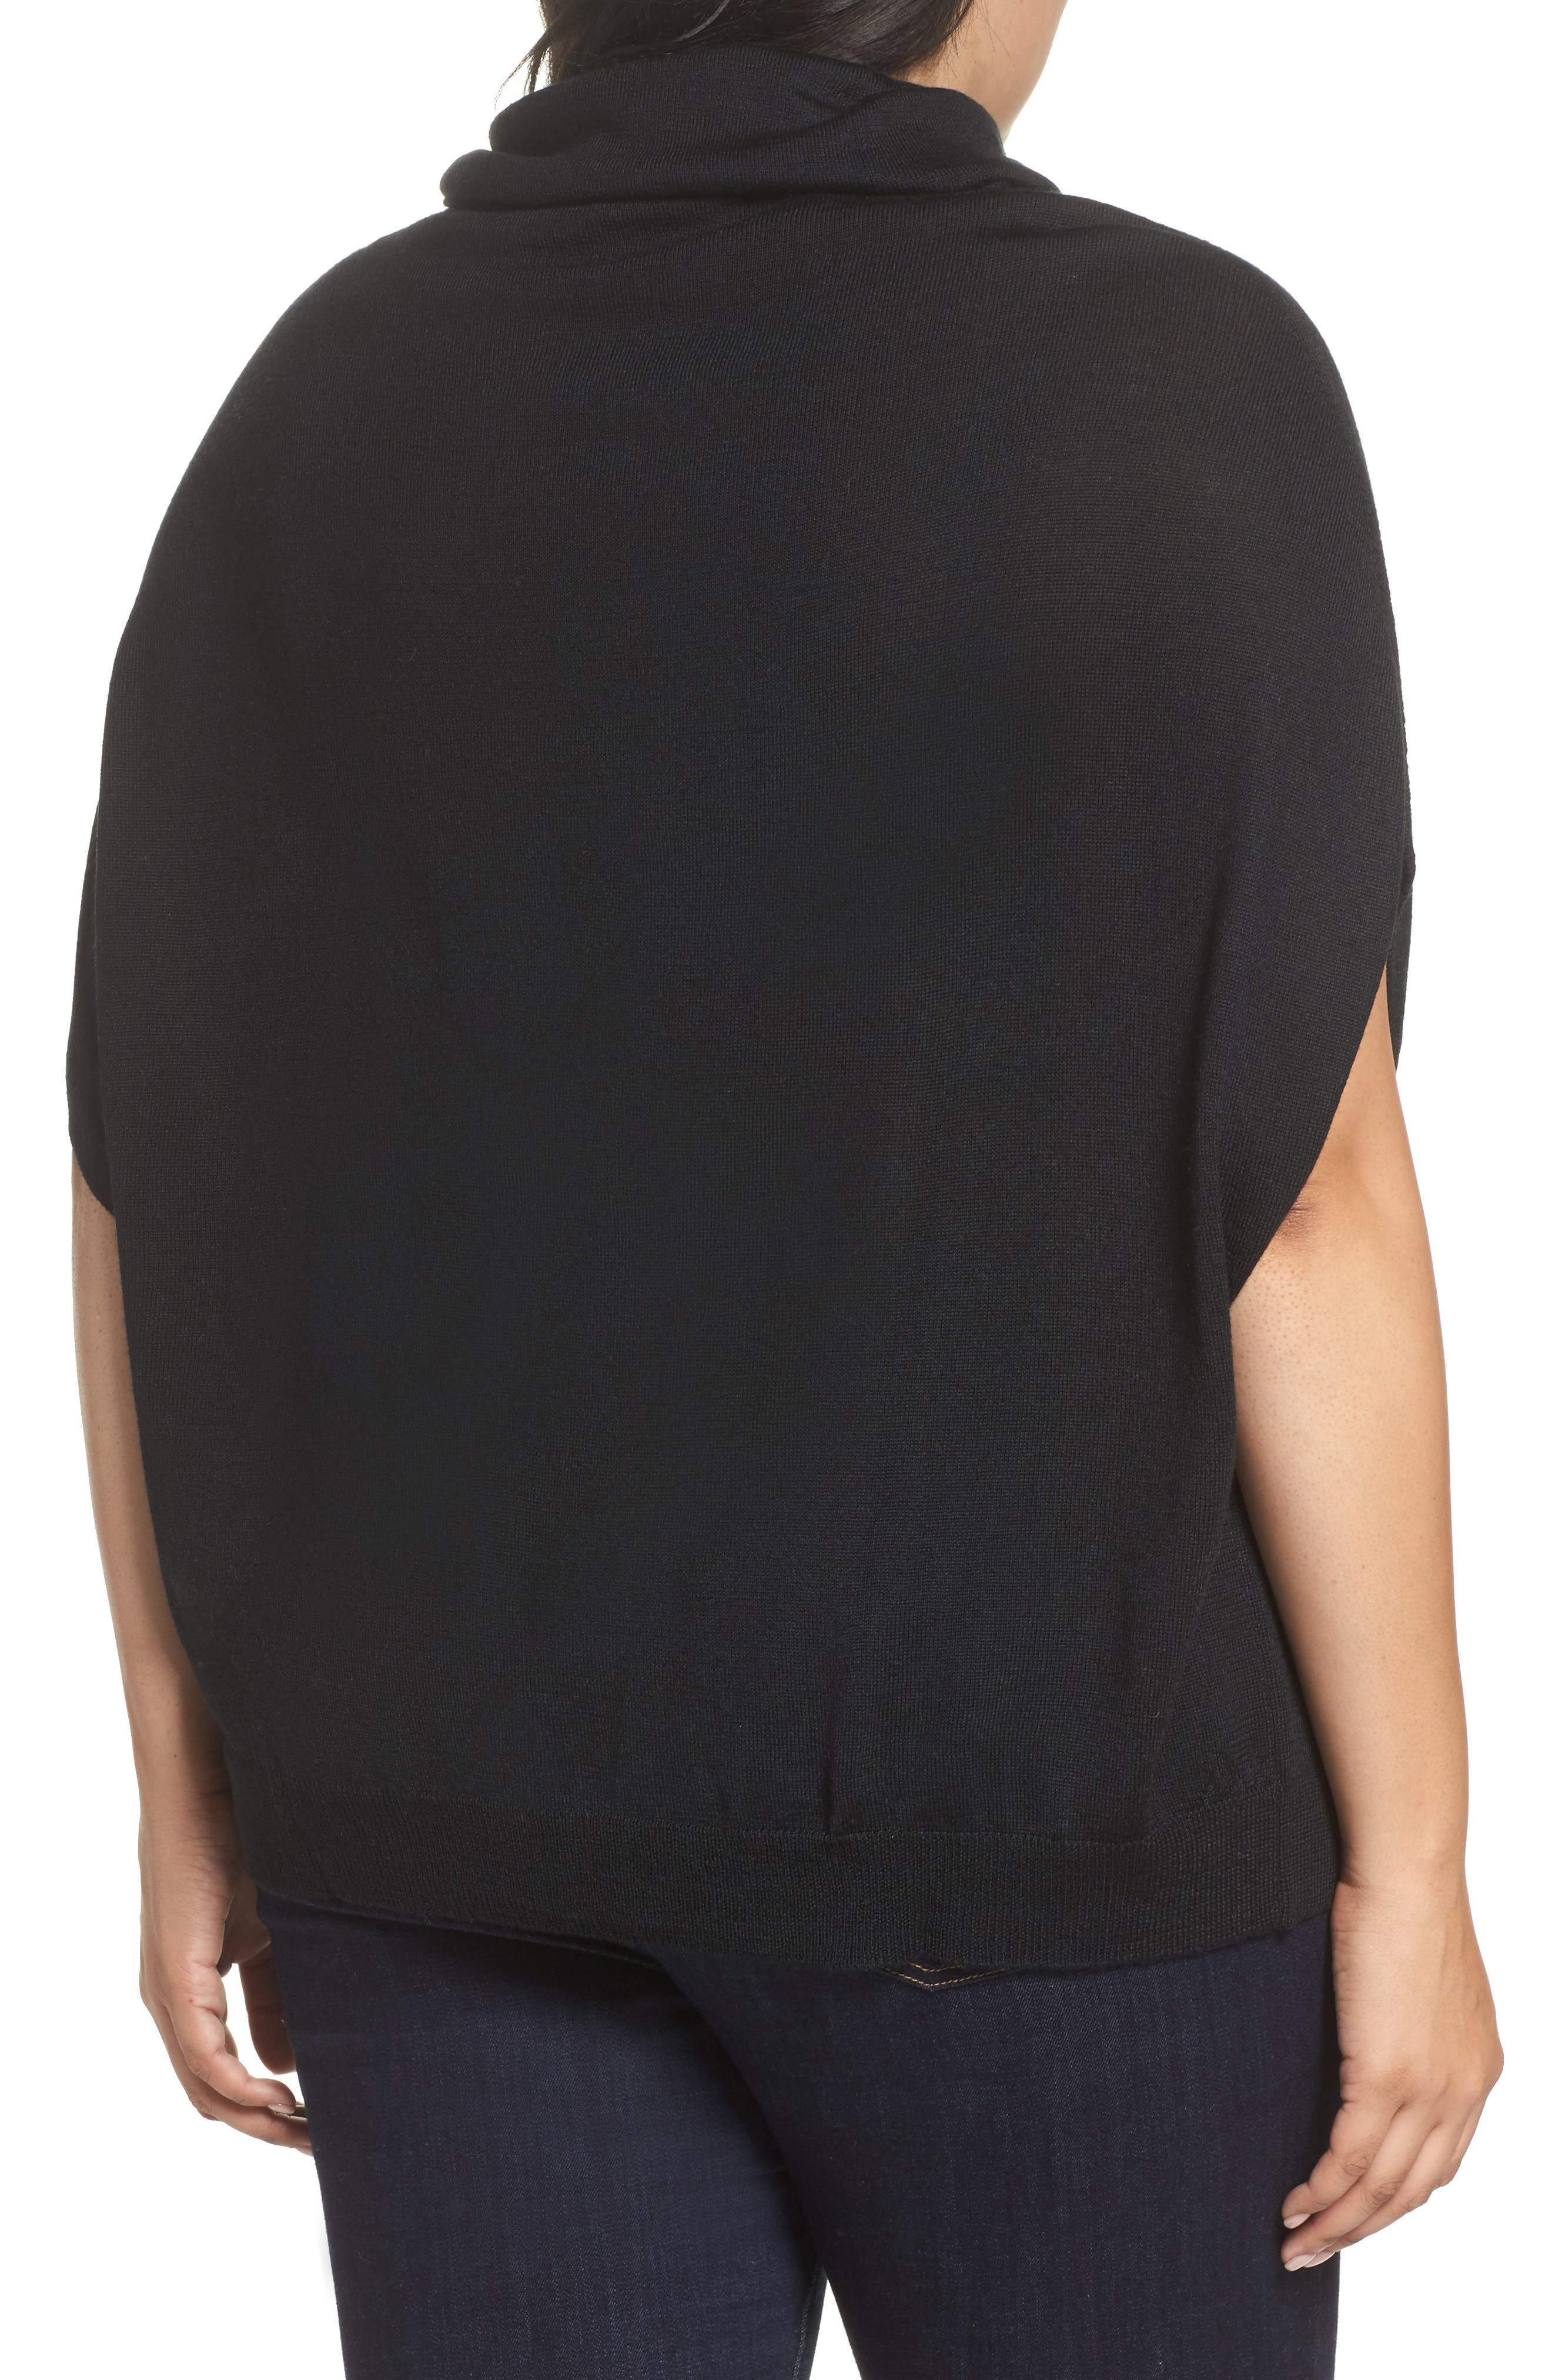 Merino Wool Blend Turtleneck Sweater,                             Alternate thumbnail 2, color,                             Black